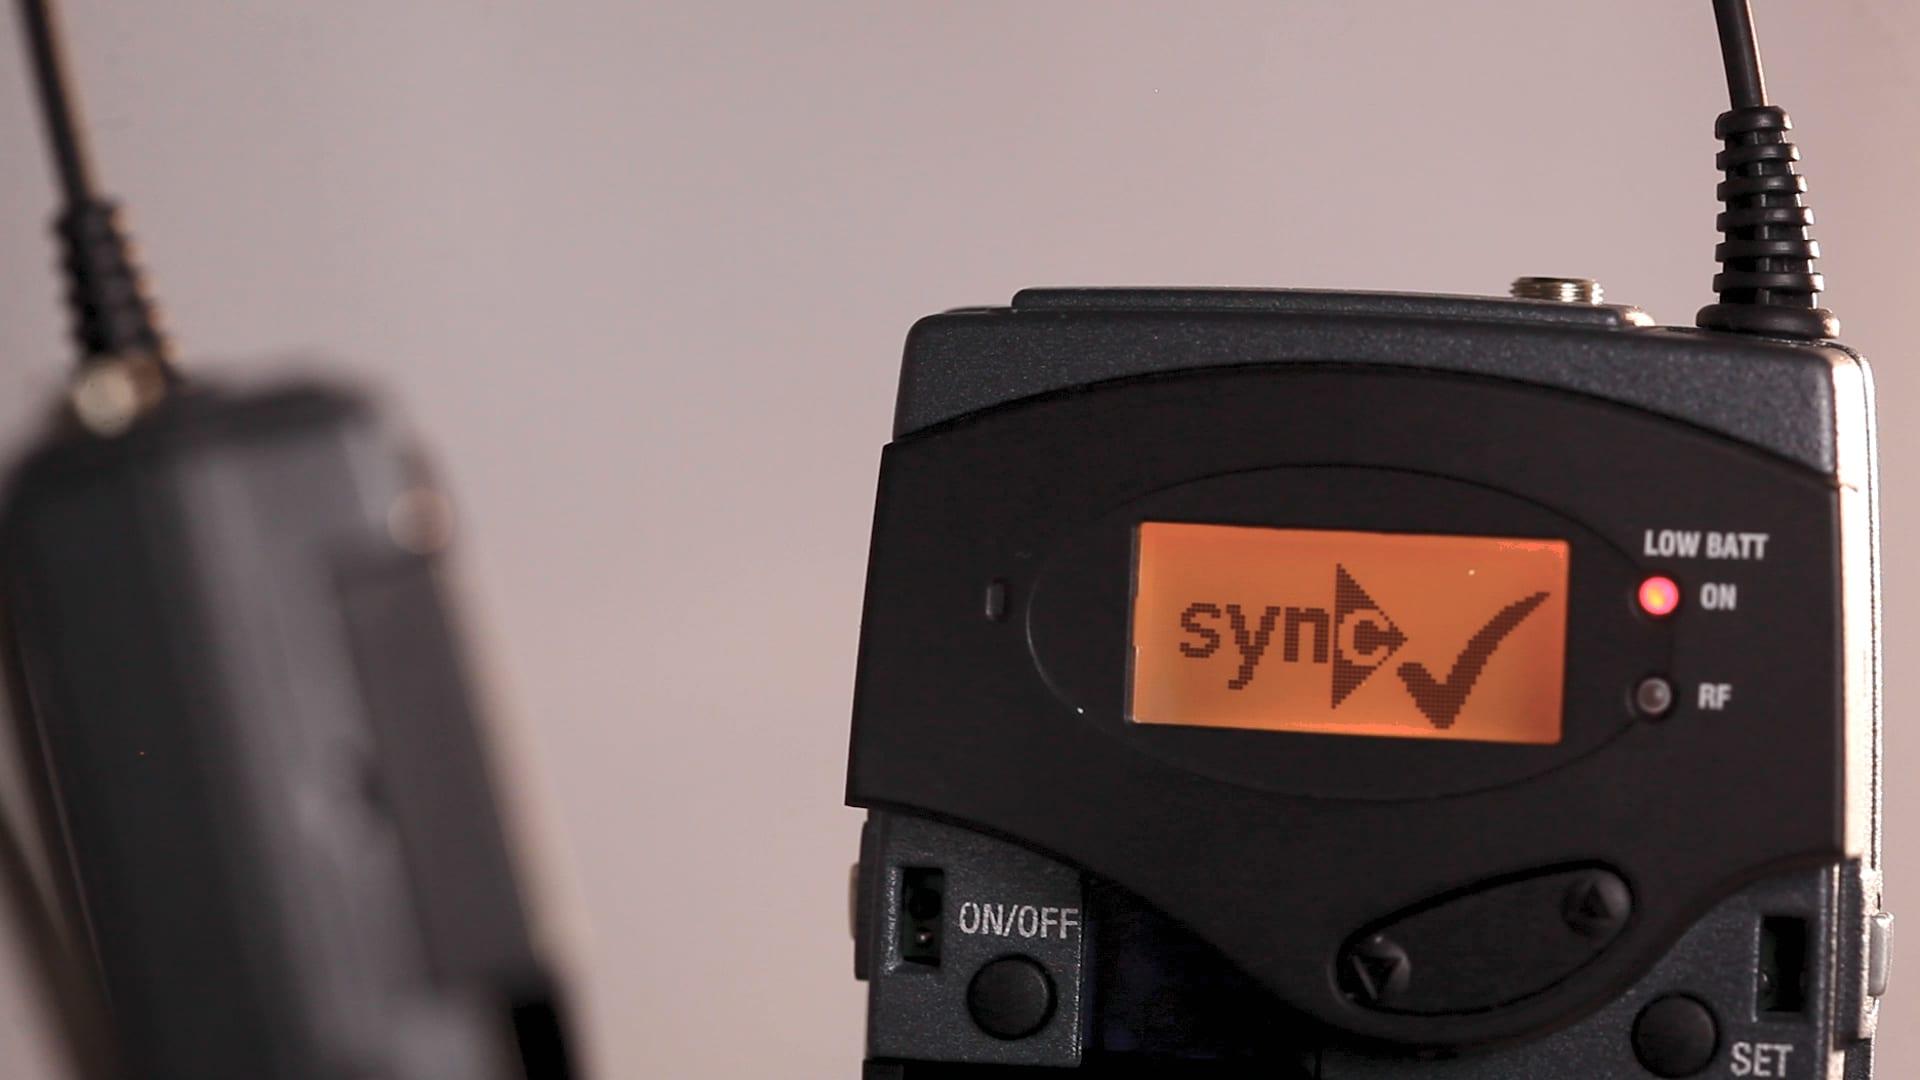 sennheiser-g3-receiver-transmitter-sync